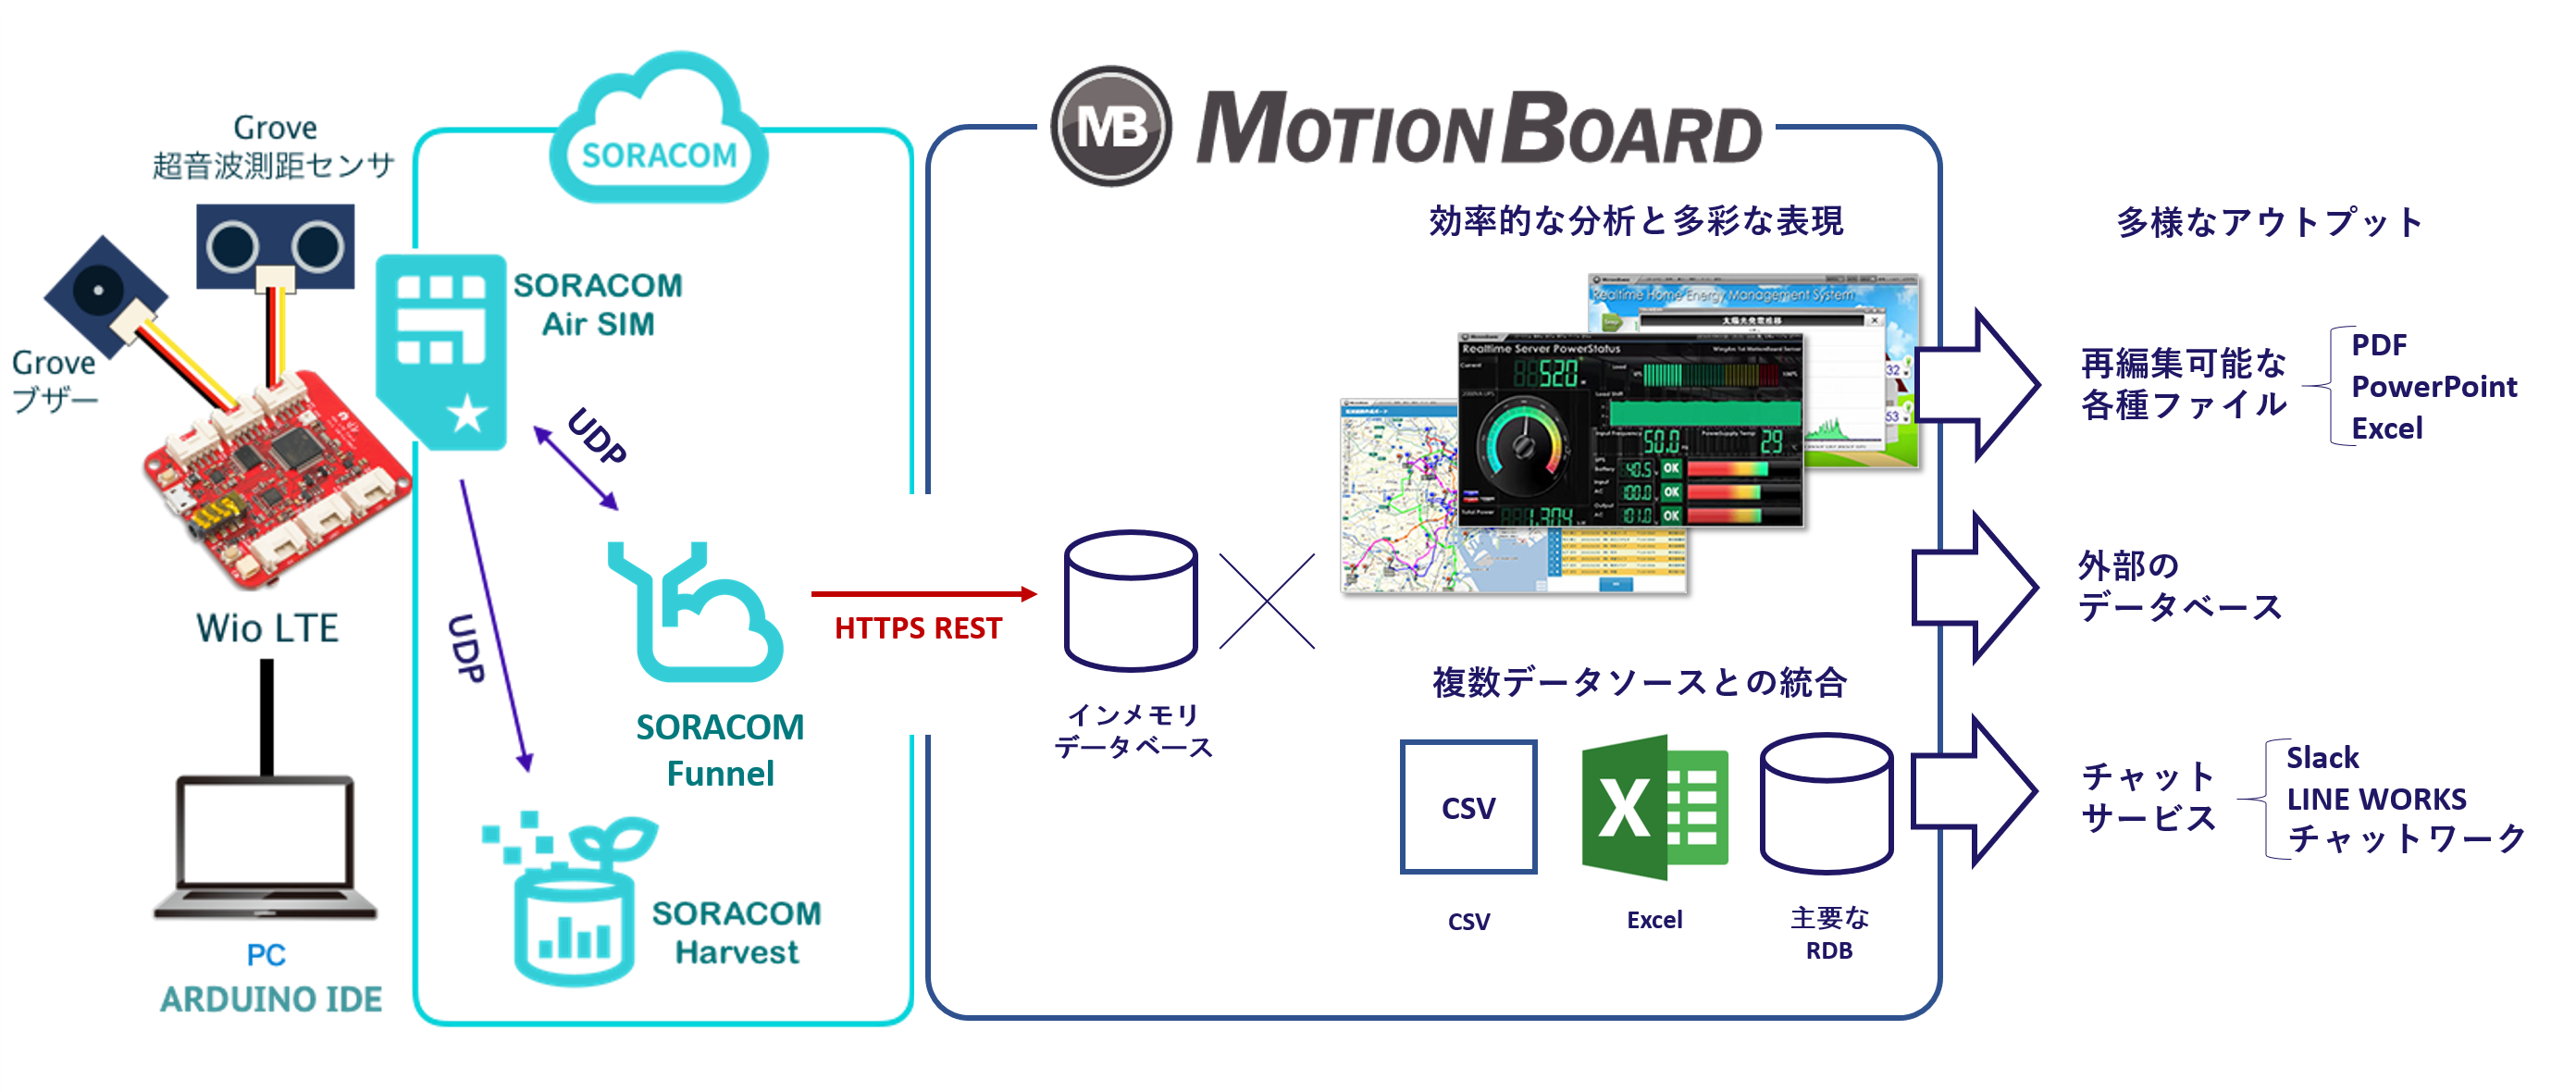 SORACOM Funnel を使って MotionBoard で分析